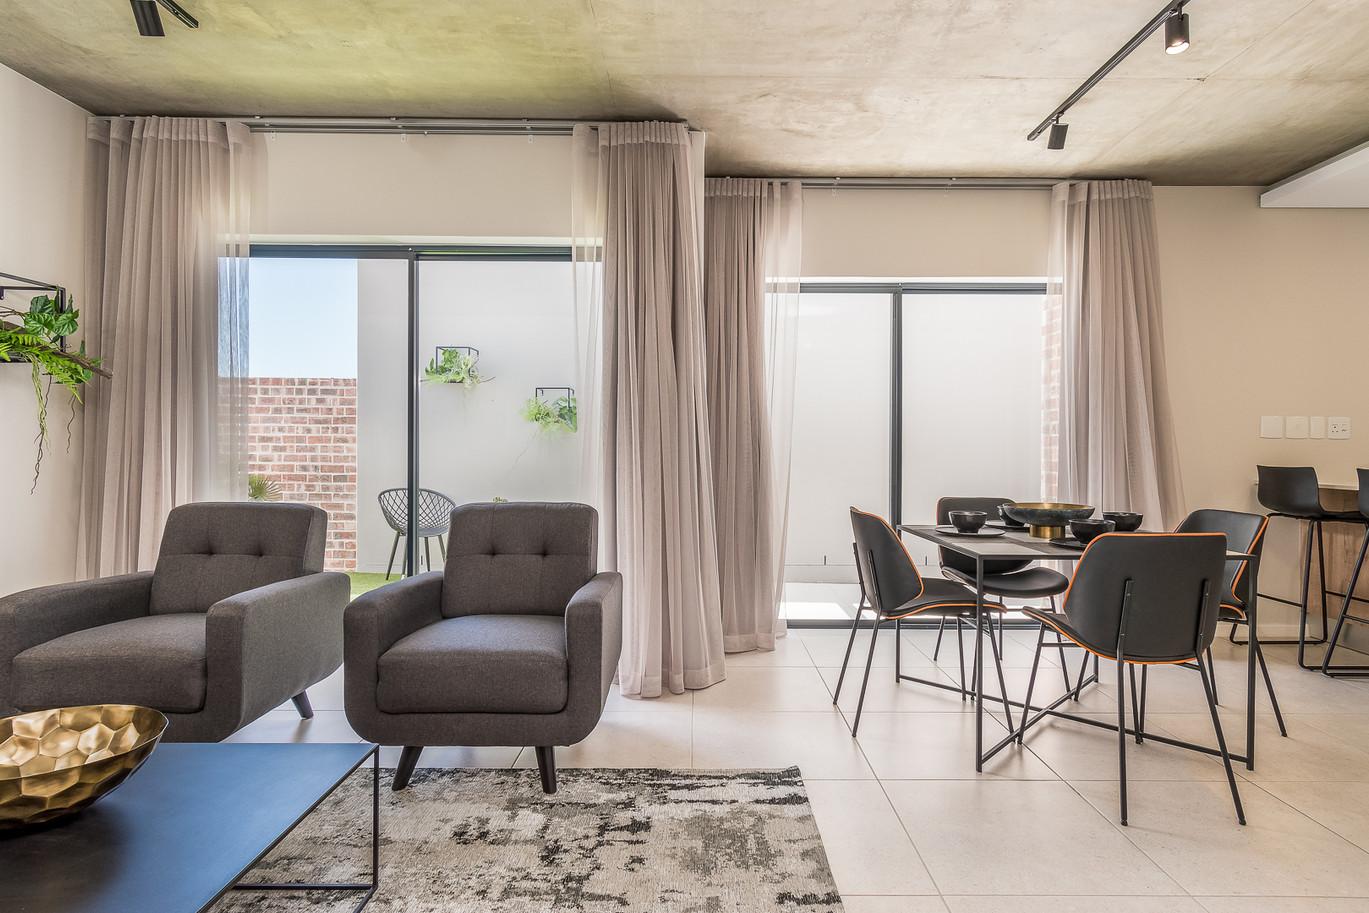 Greystone-Lounge and Dining Room.jpg